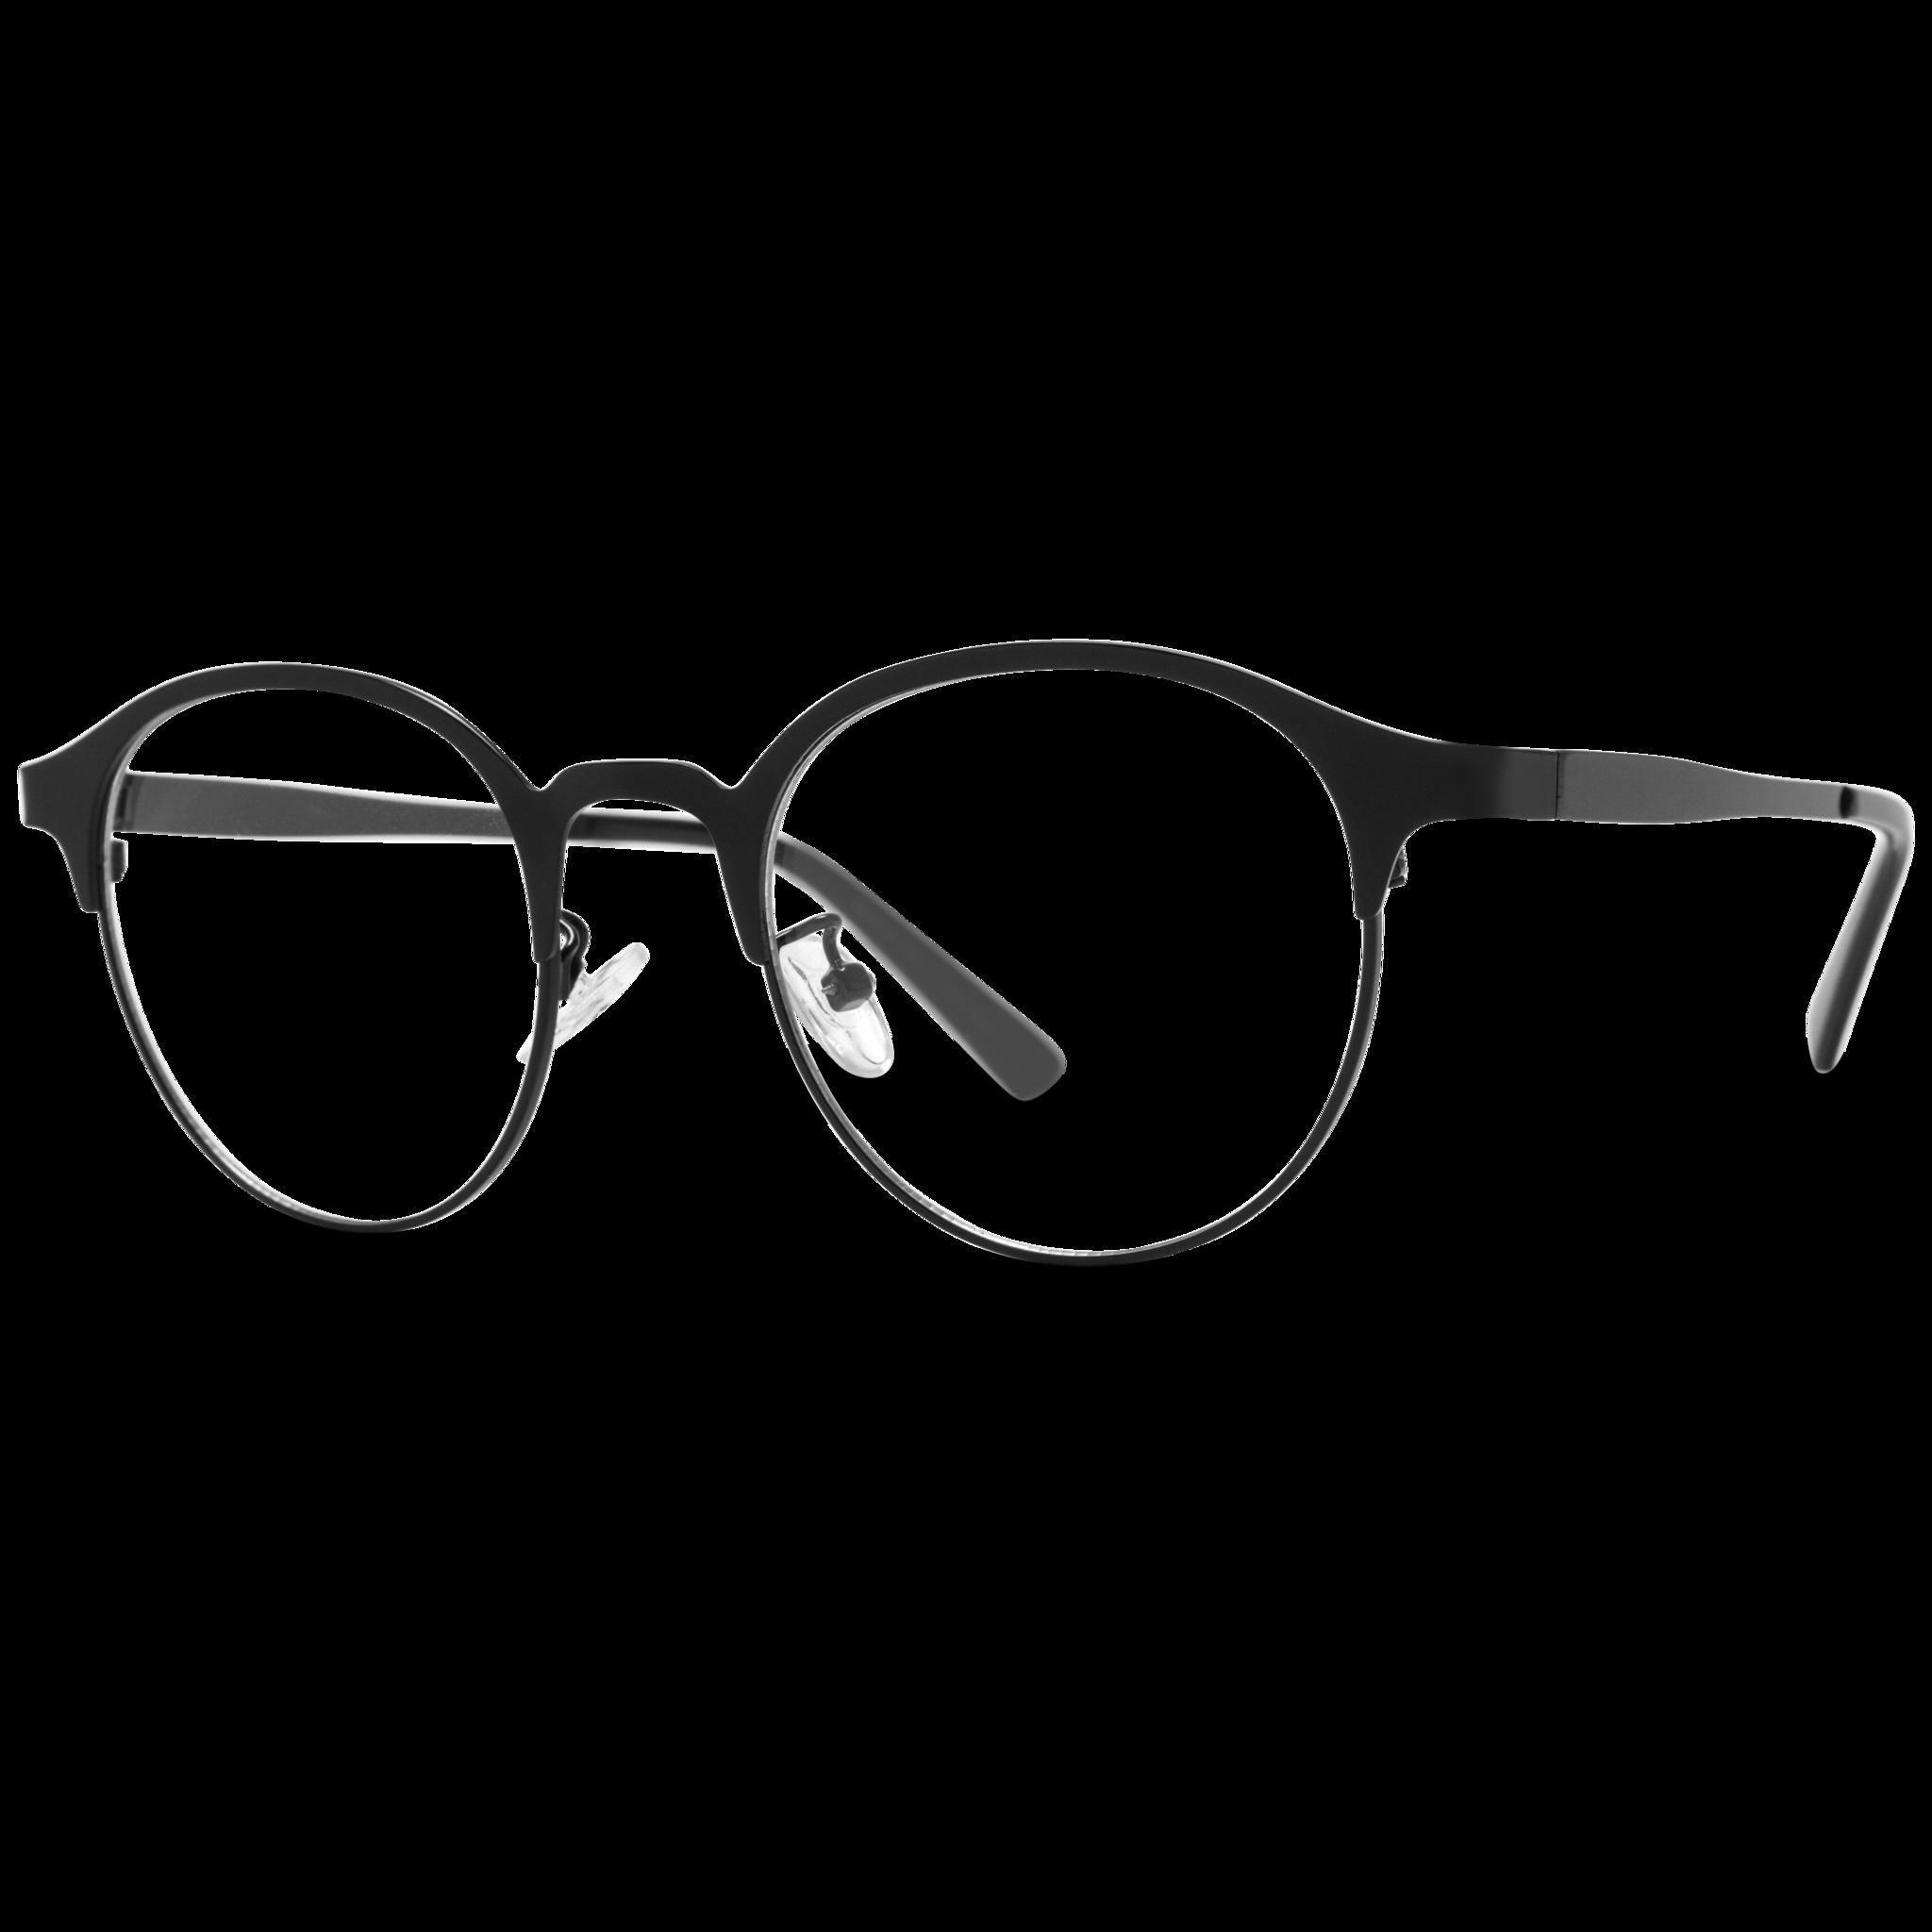 Pin By Wearme Pro On Recursos Ibis In 2021 Retro Glasses Stylish Eyeglasses Stylish Glasses